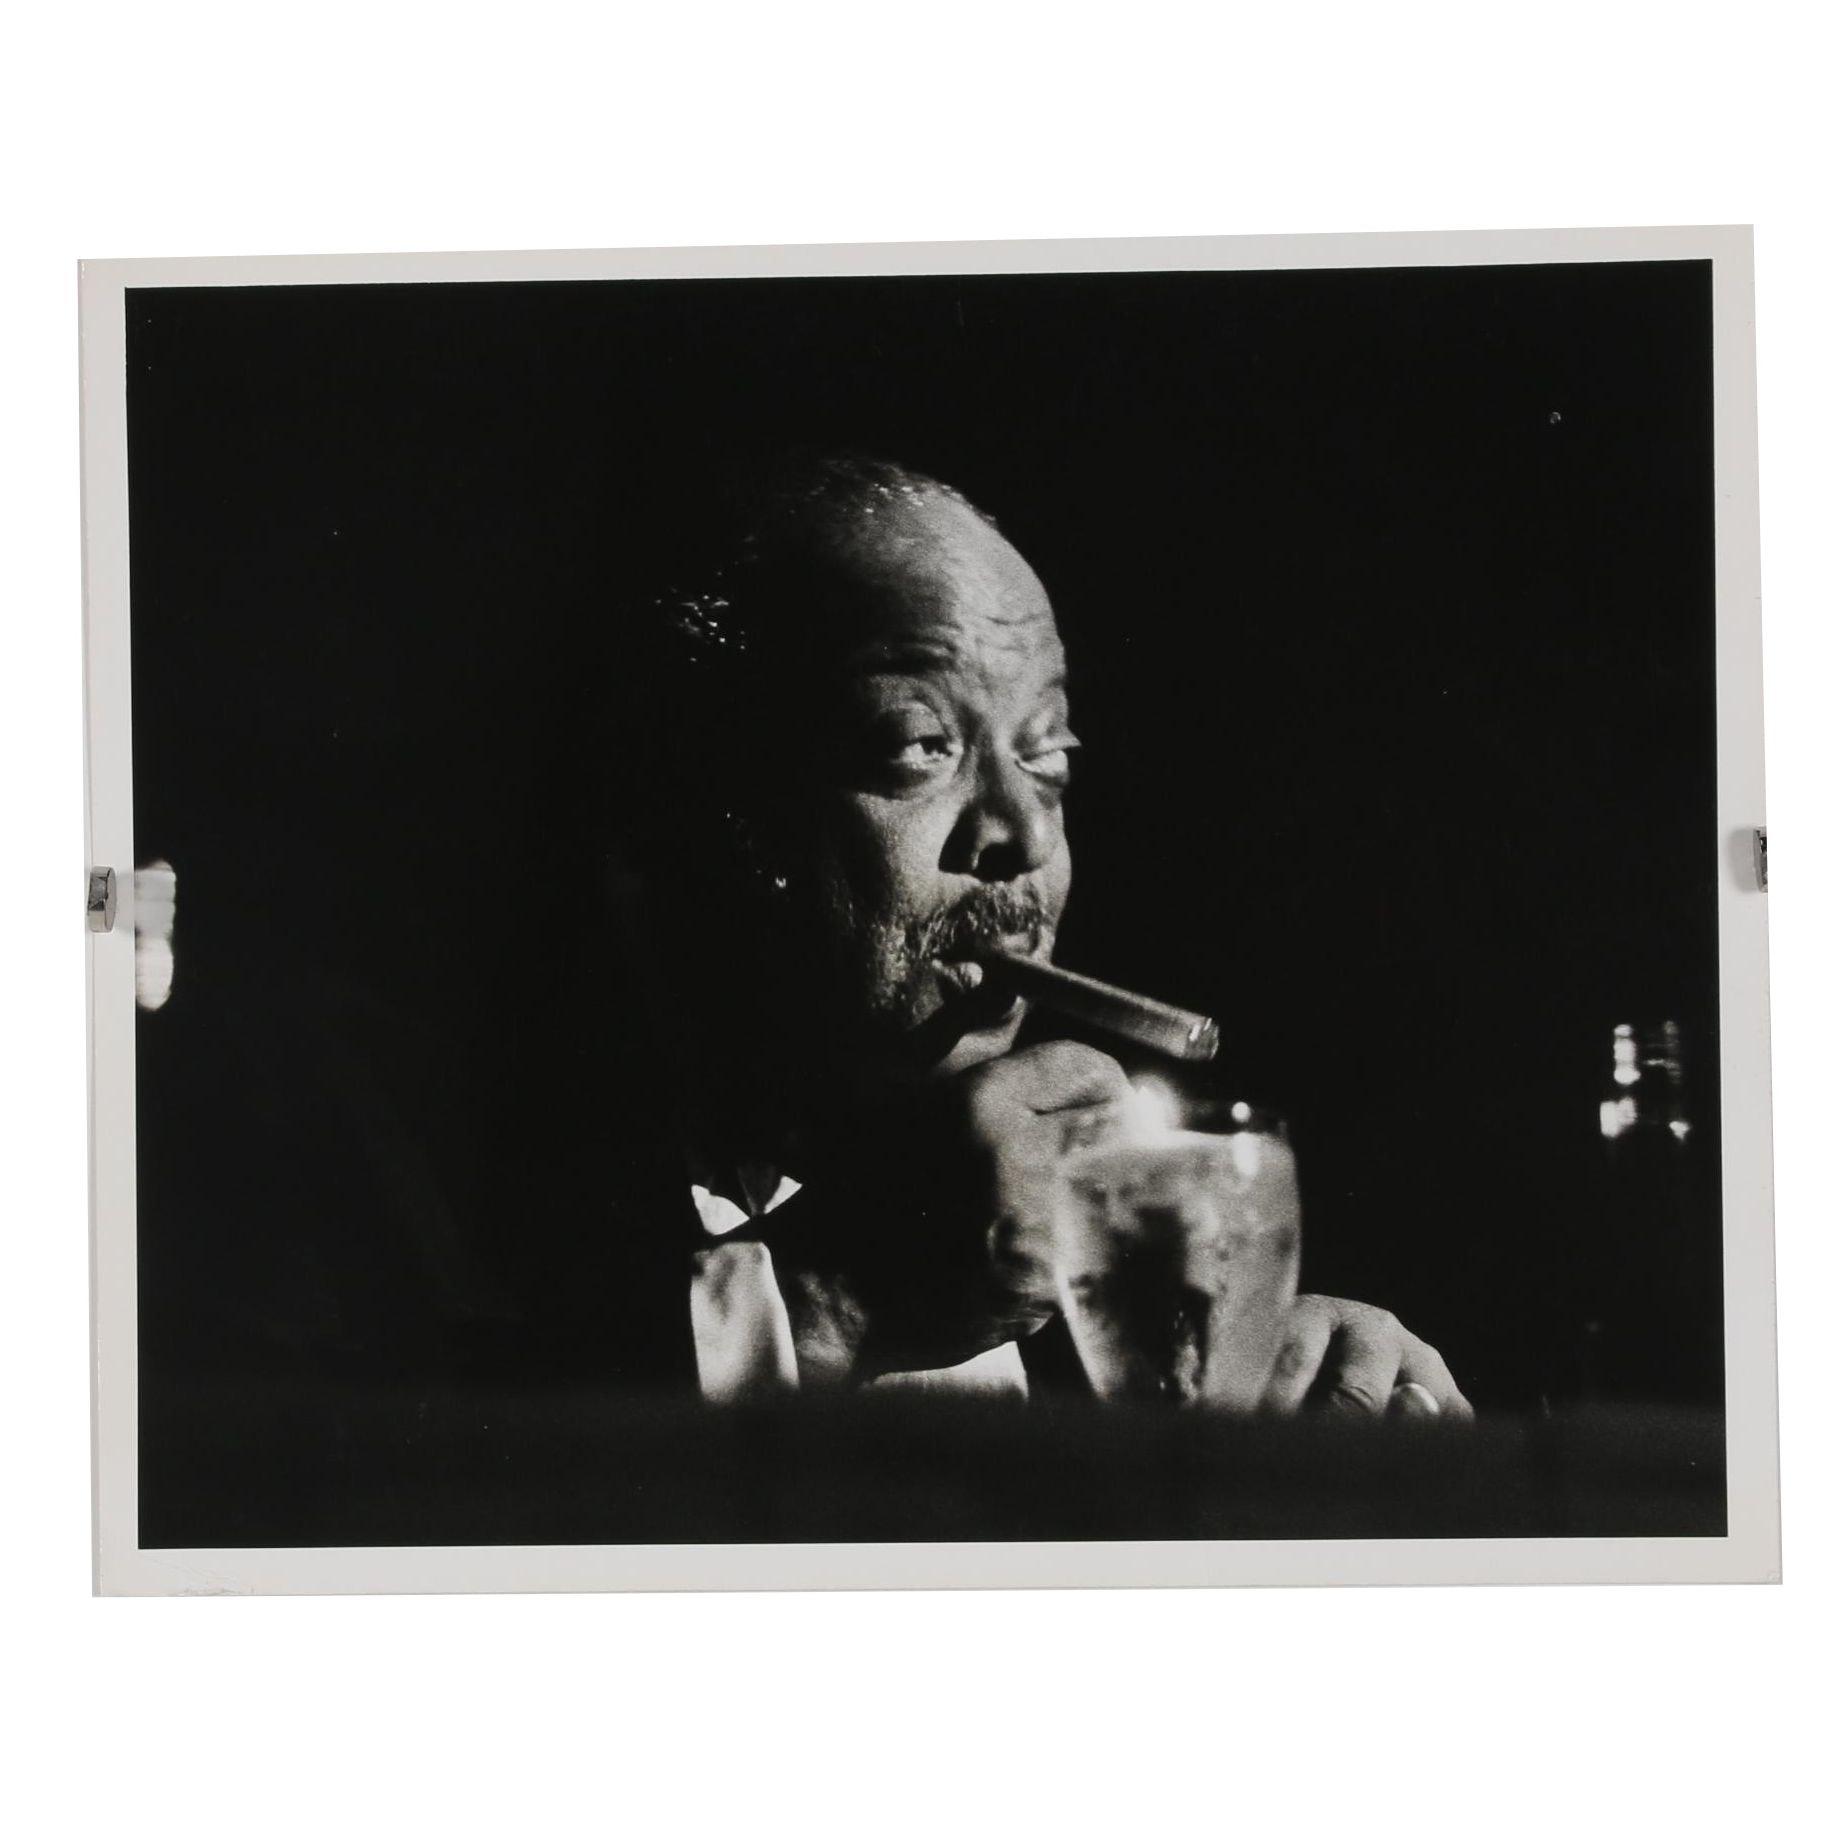 Jack Bradley Gelatin-Silver Photograph of Count Basie